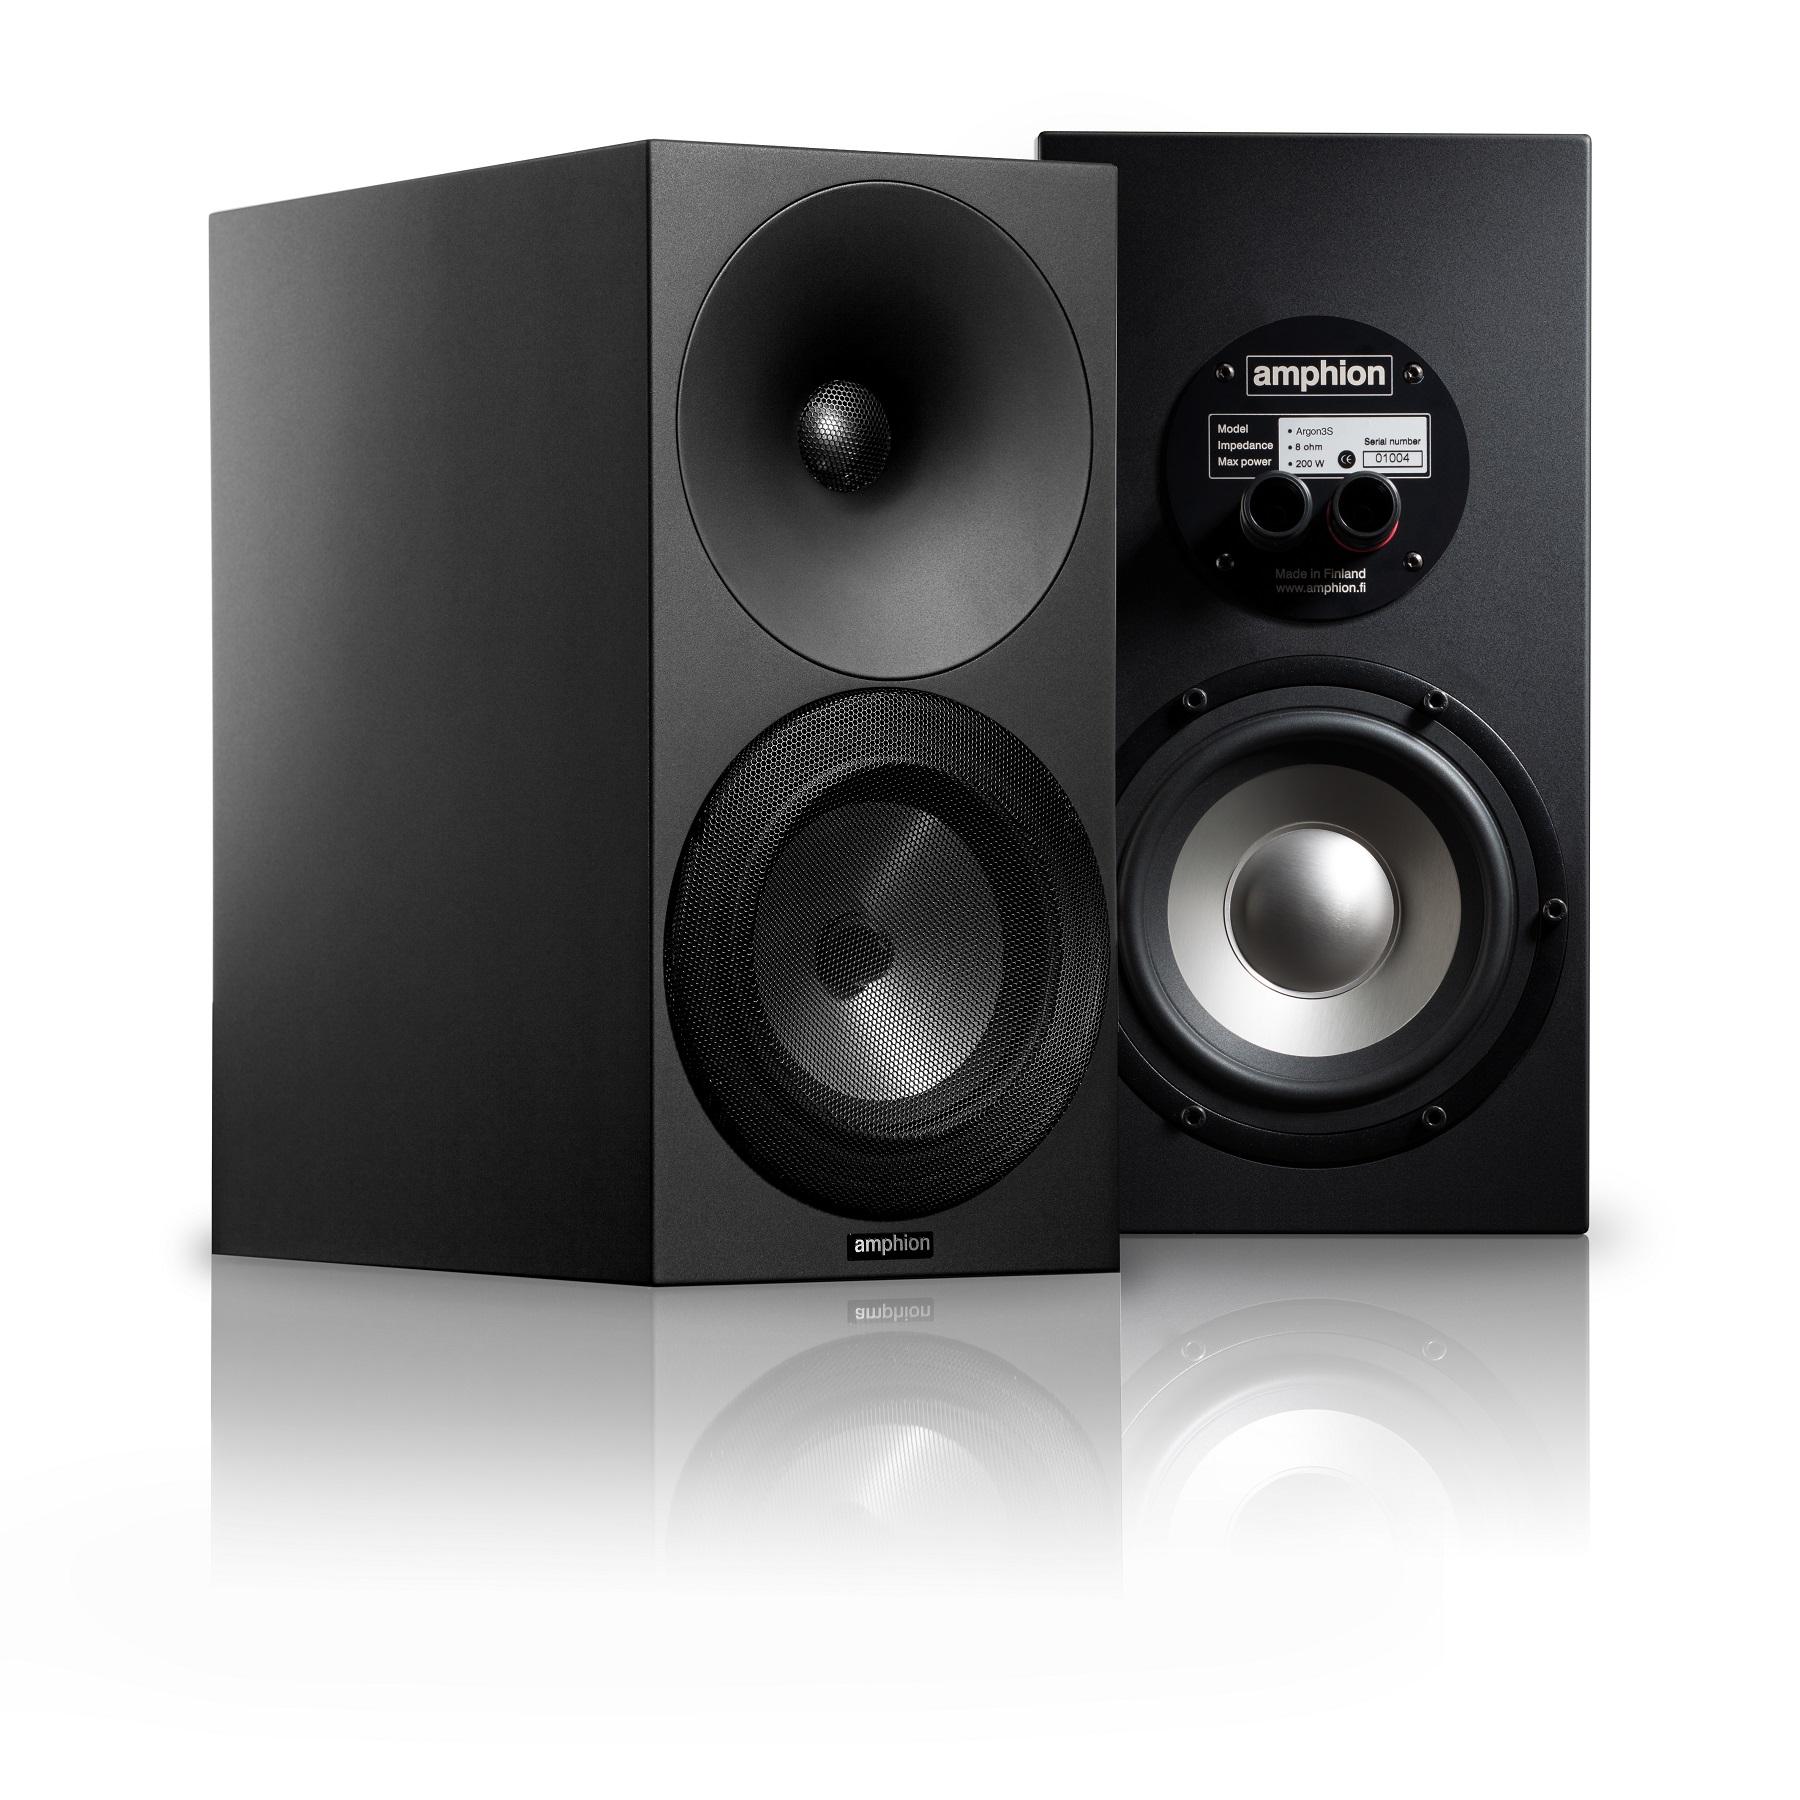 Amphion Argon 3S High-End Hangfal, fekete verzió